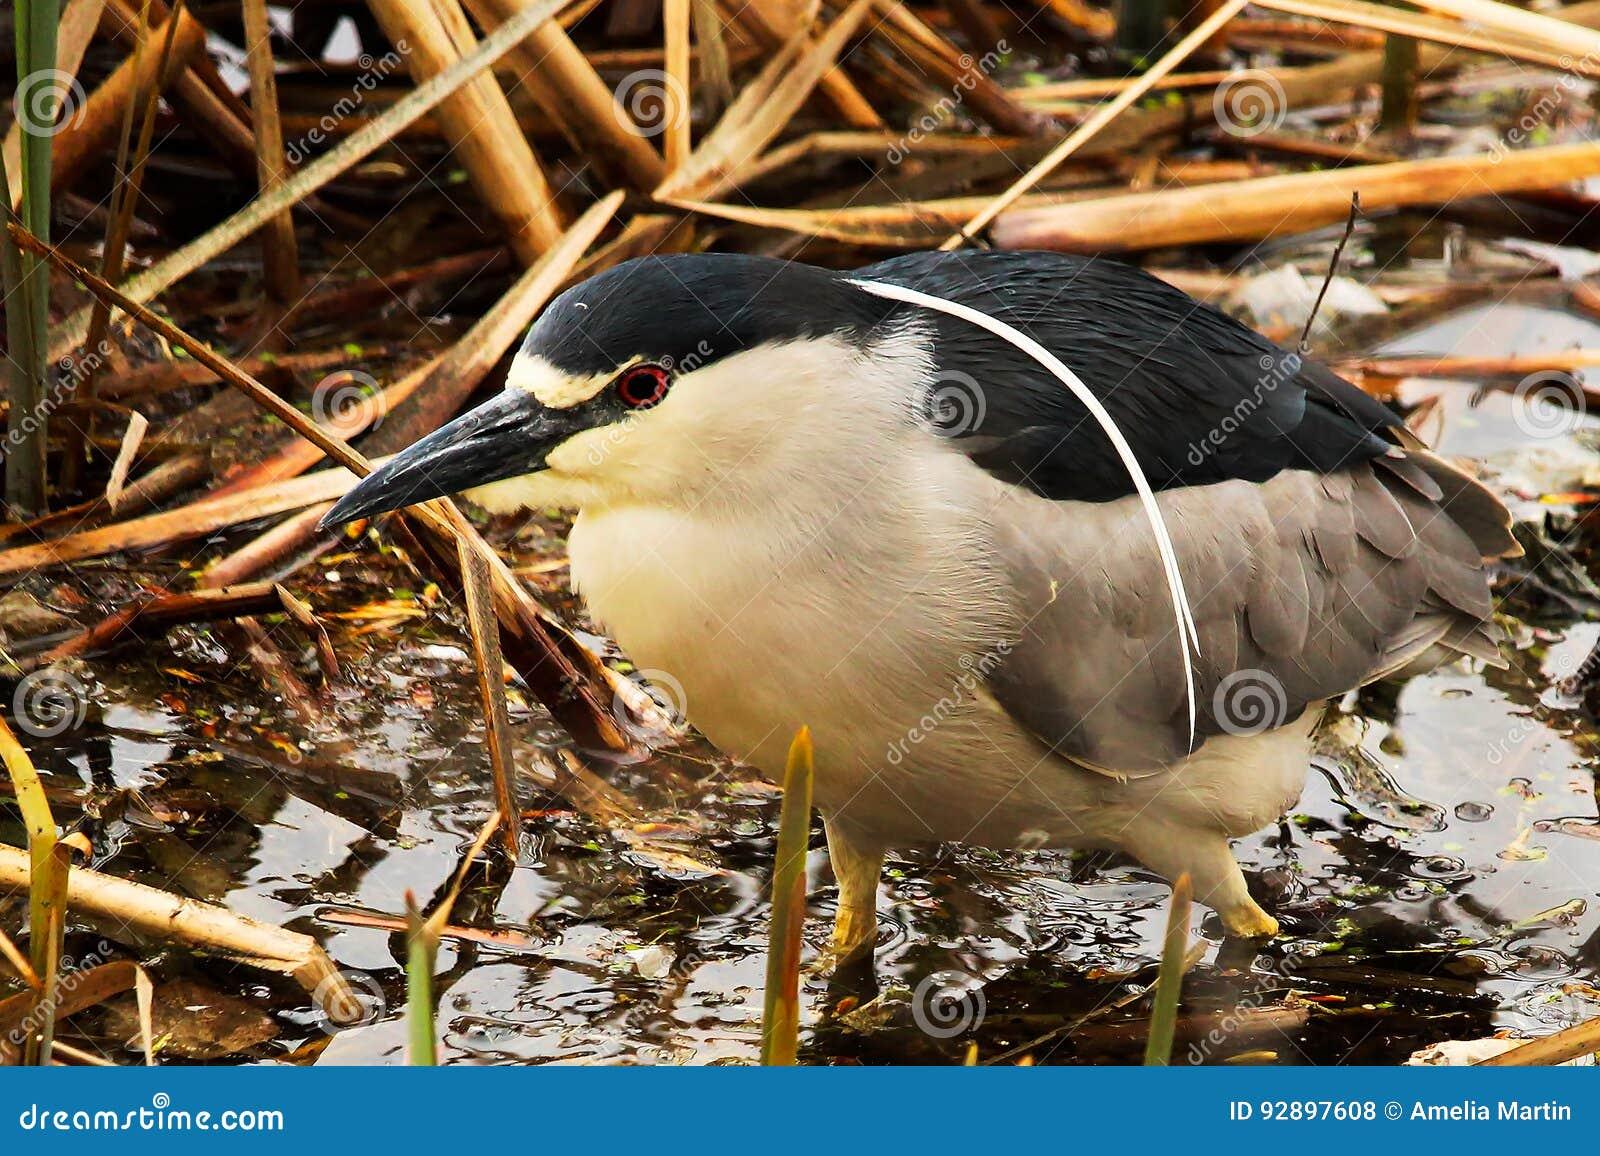 A Black Crown Night Heron walking along dried reeds